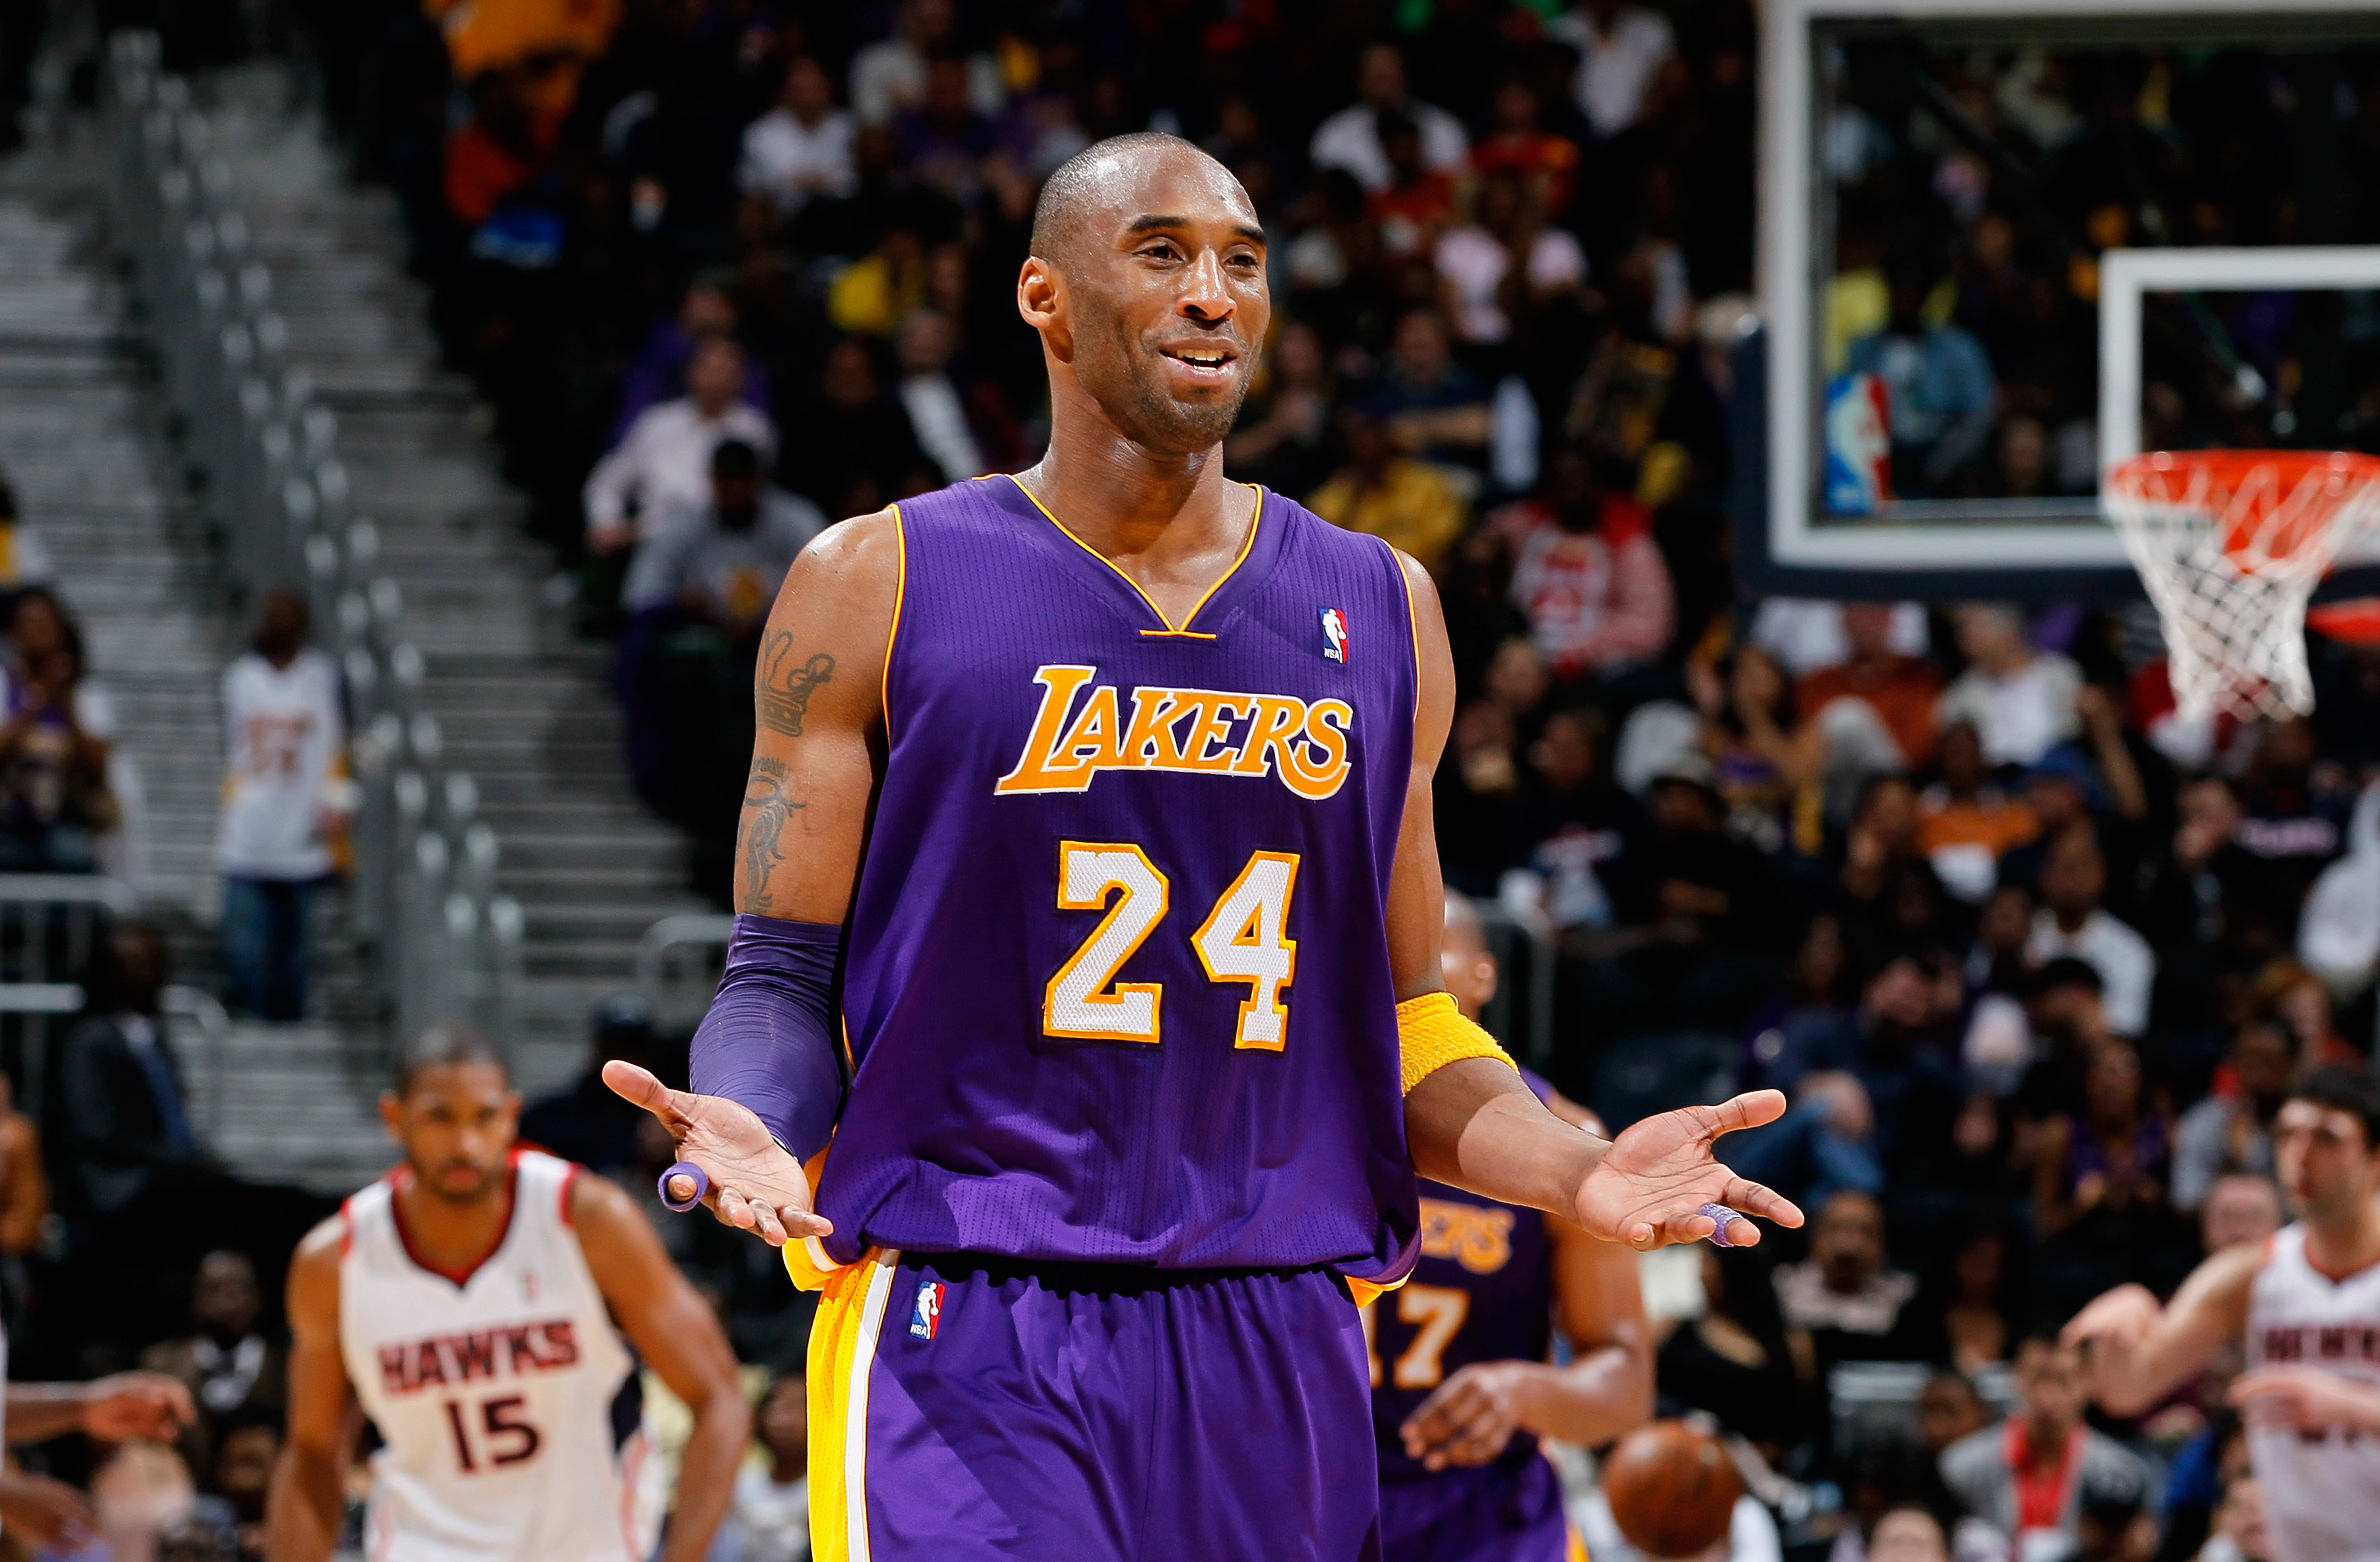 Kobe Bryant - The man the Lakers build around.